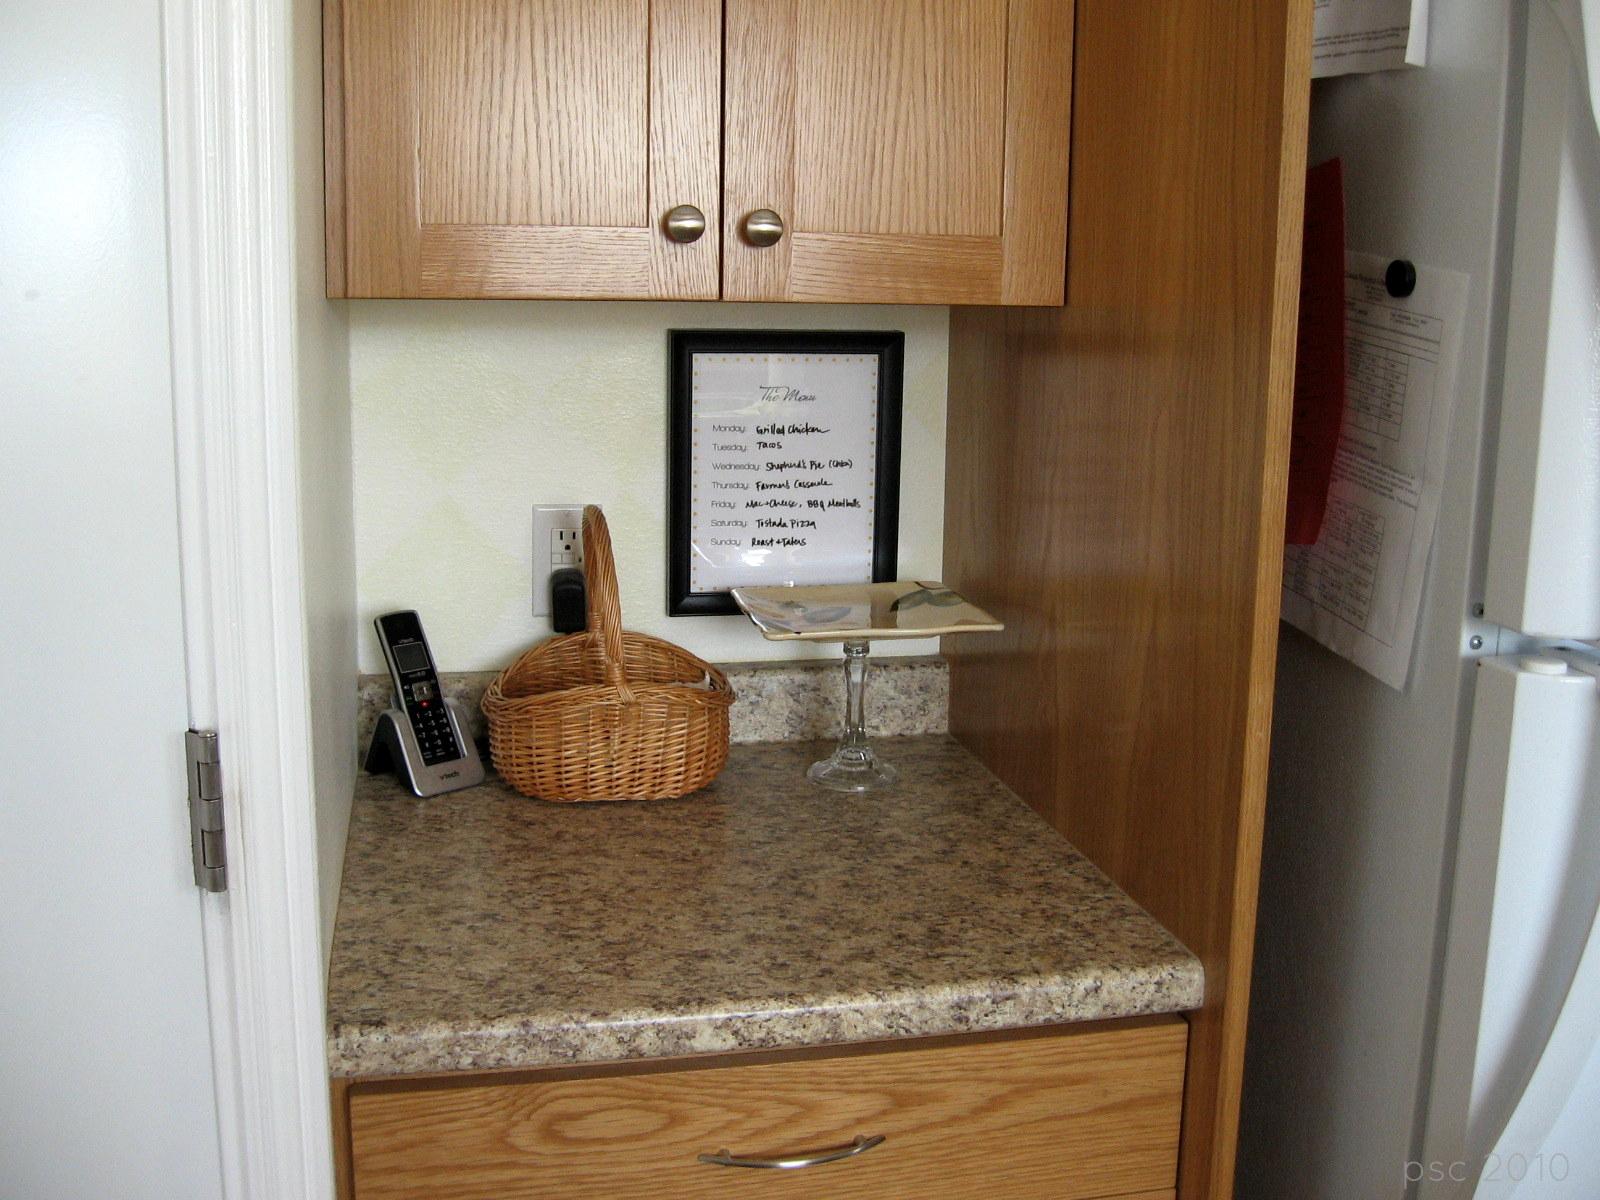 Kitchen Sink Drainboard Stainless Steel  By